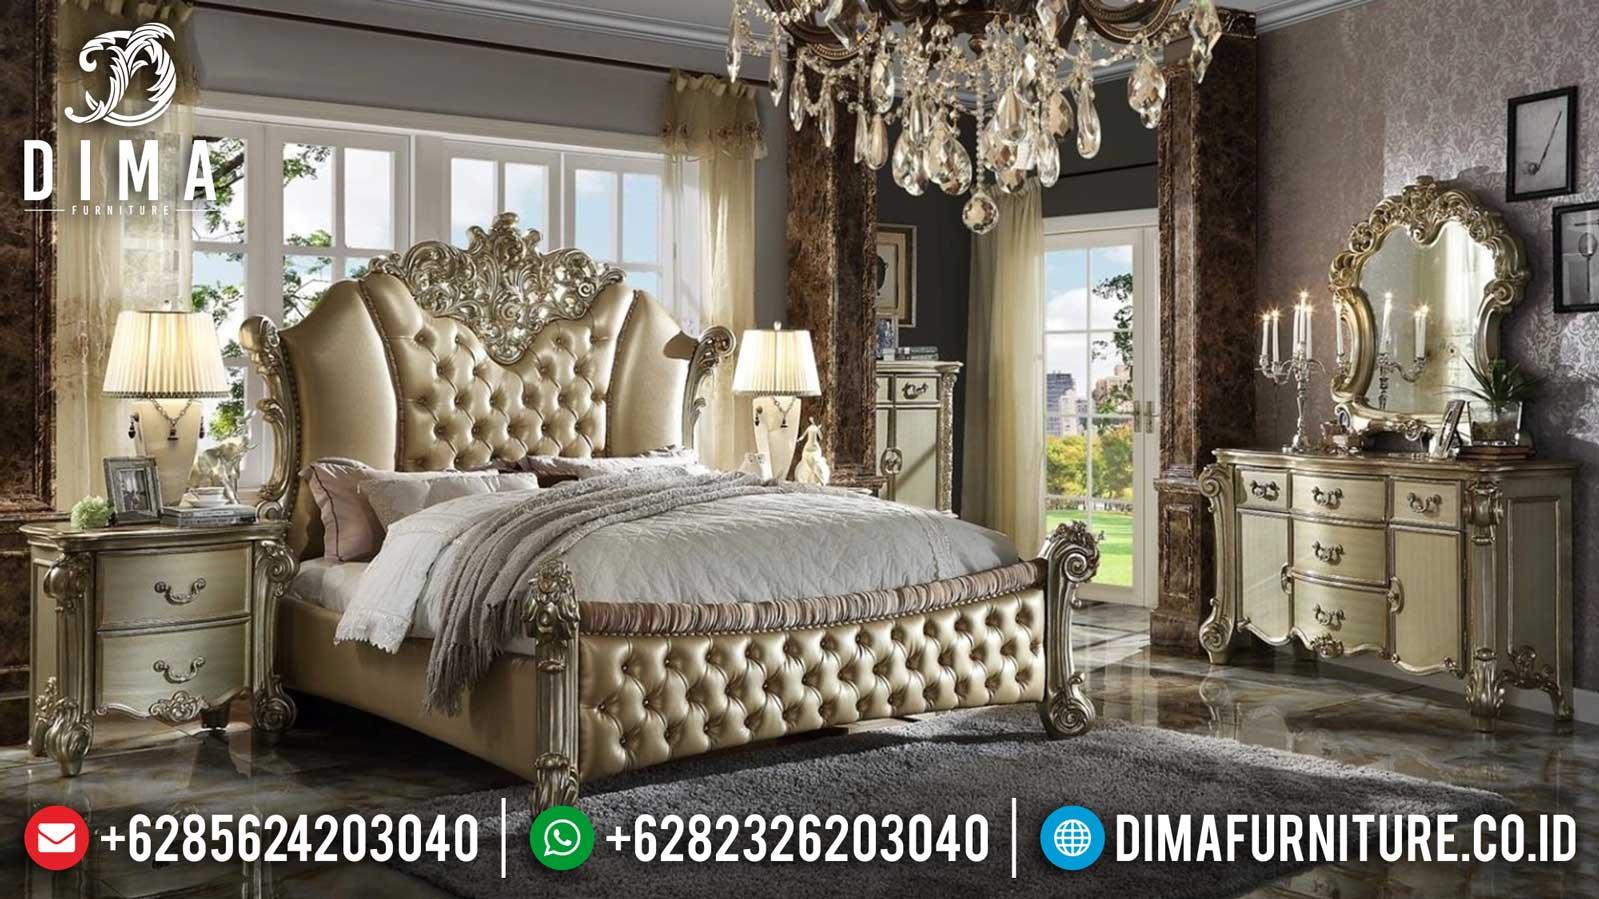 Elite Class Tempat Tidur Mewah Ukiran Luxury Classic Furniture Jepara TTJ-1138